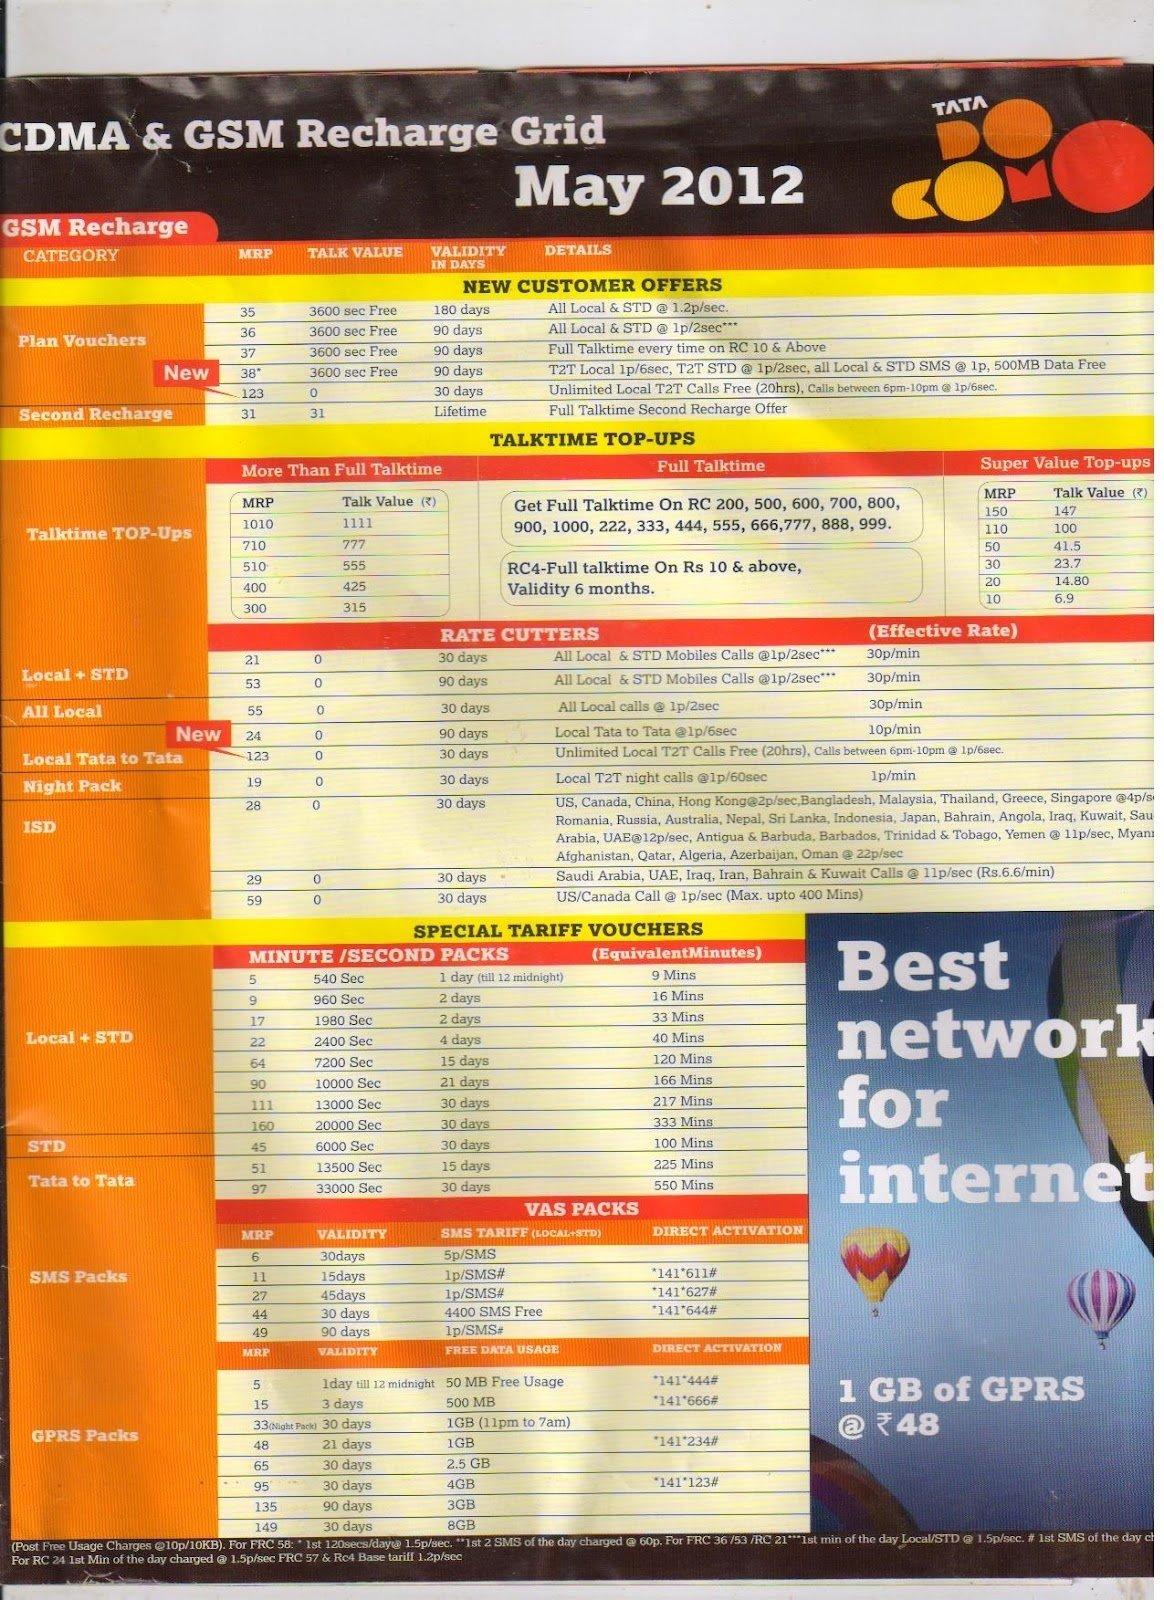 10 Stunning Idea Online Recharge Andhra Pradesh recharge tariff andhra pradesh india telicom 2012 world social news